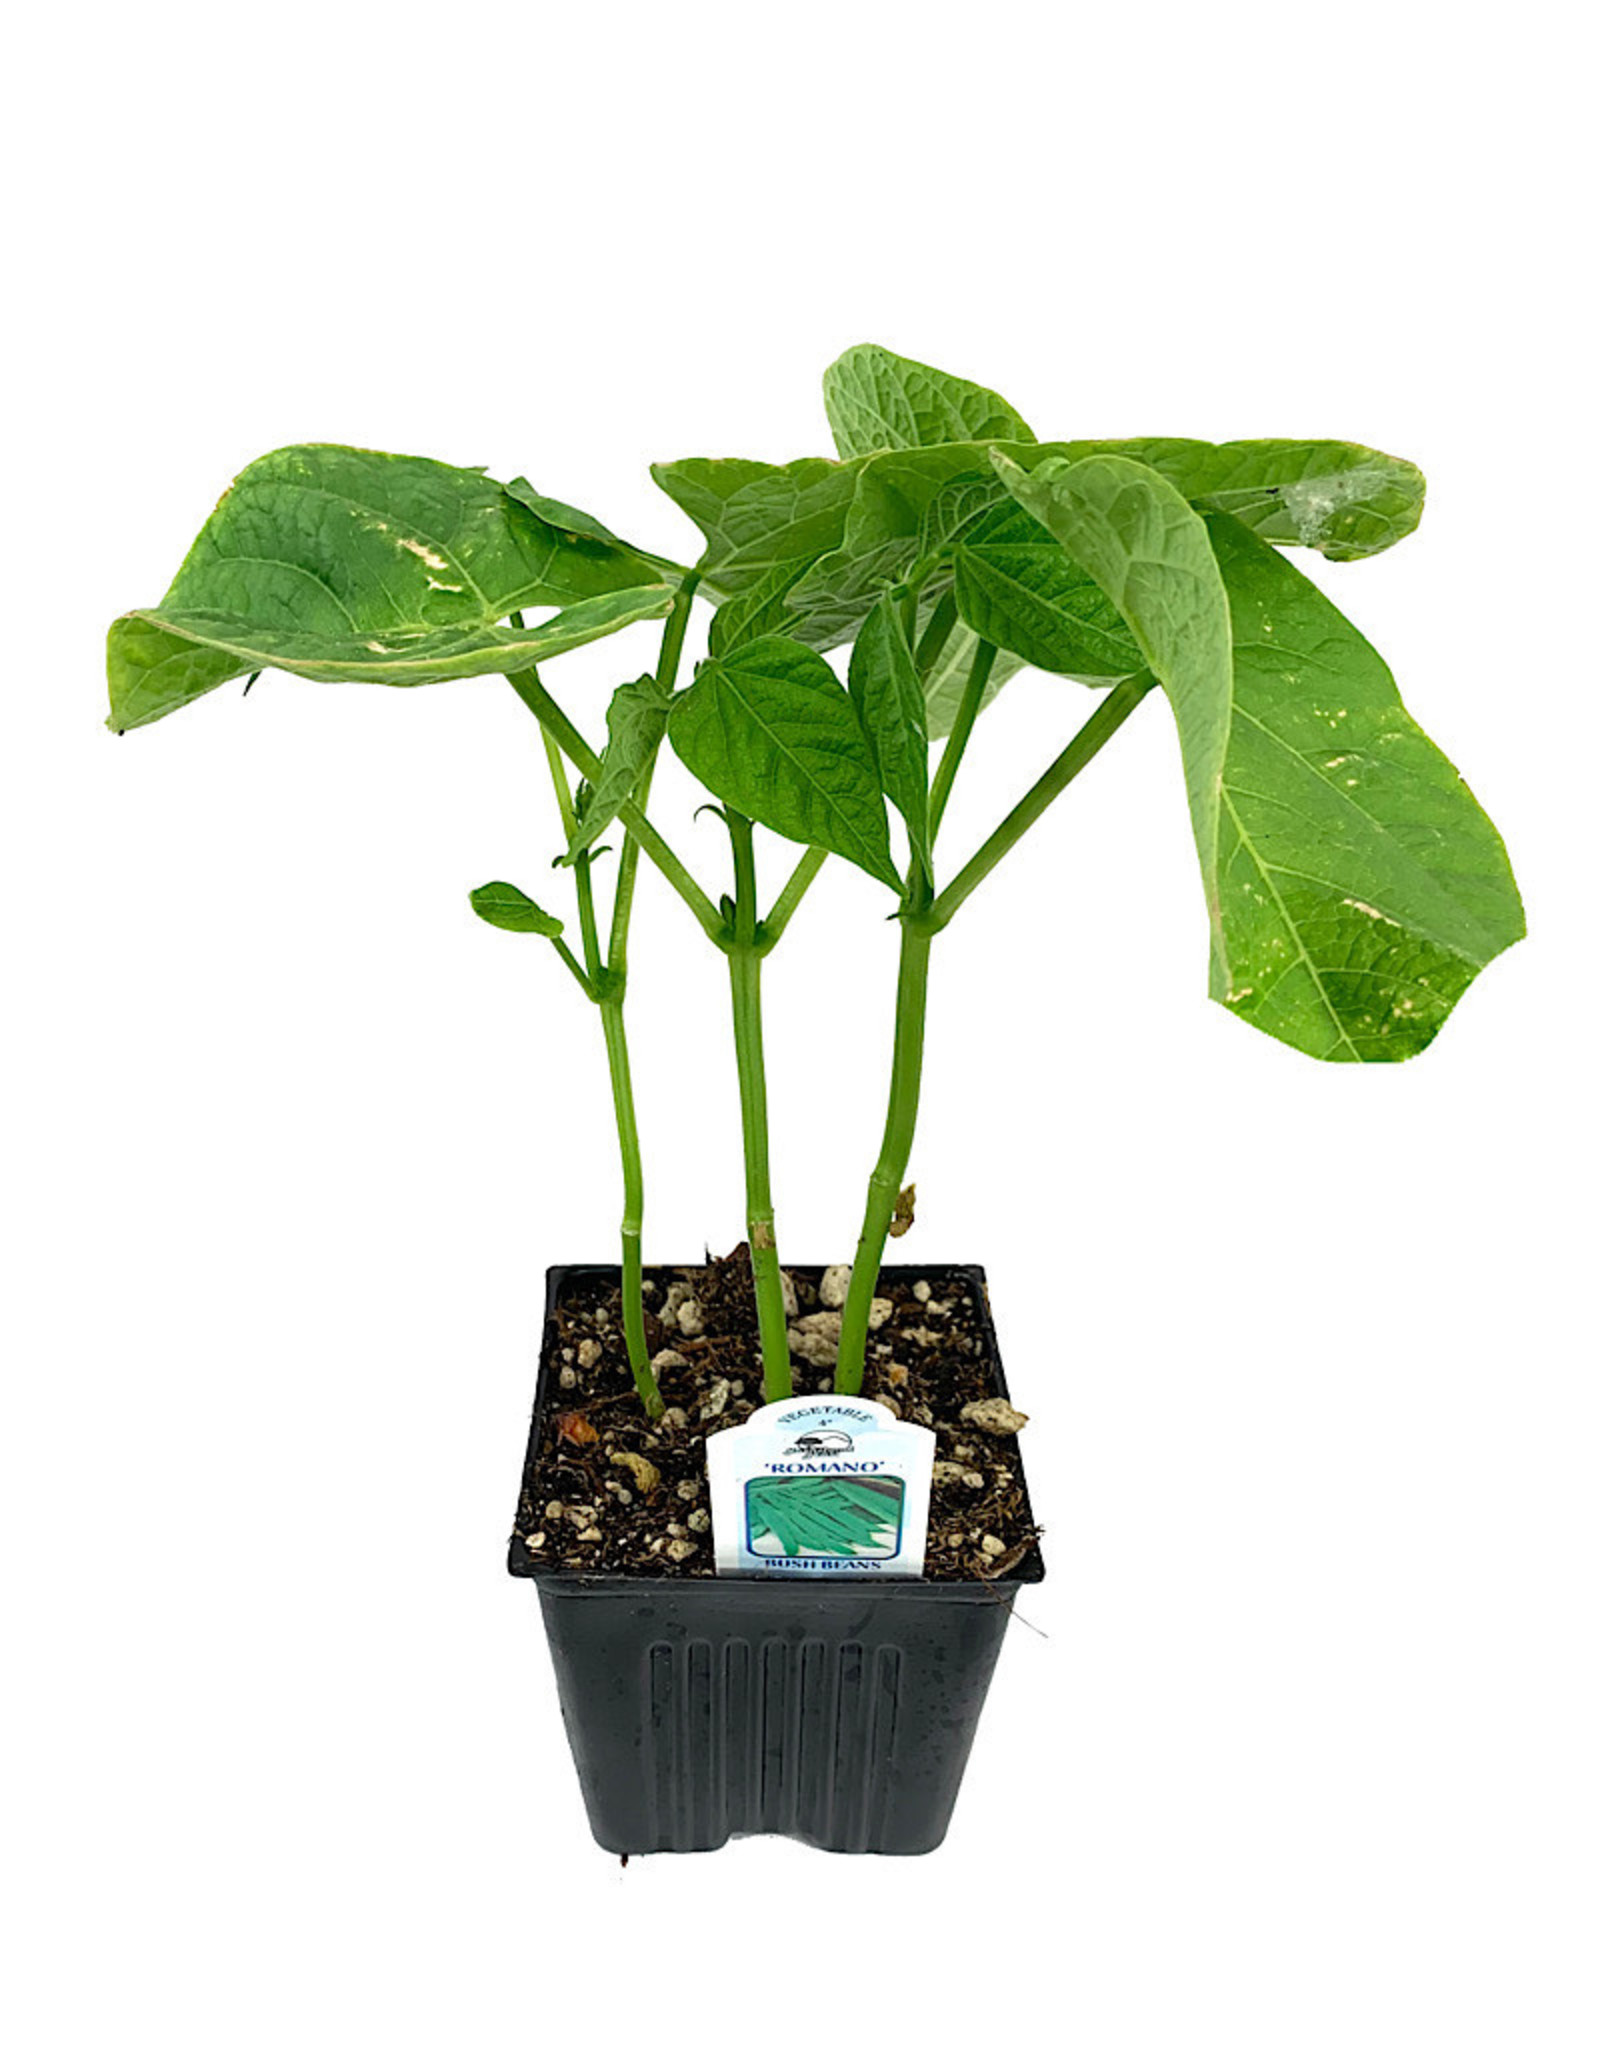 Bean 'Romano Bush' 4 inch